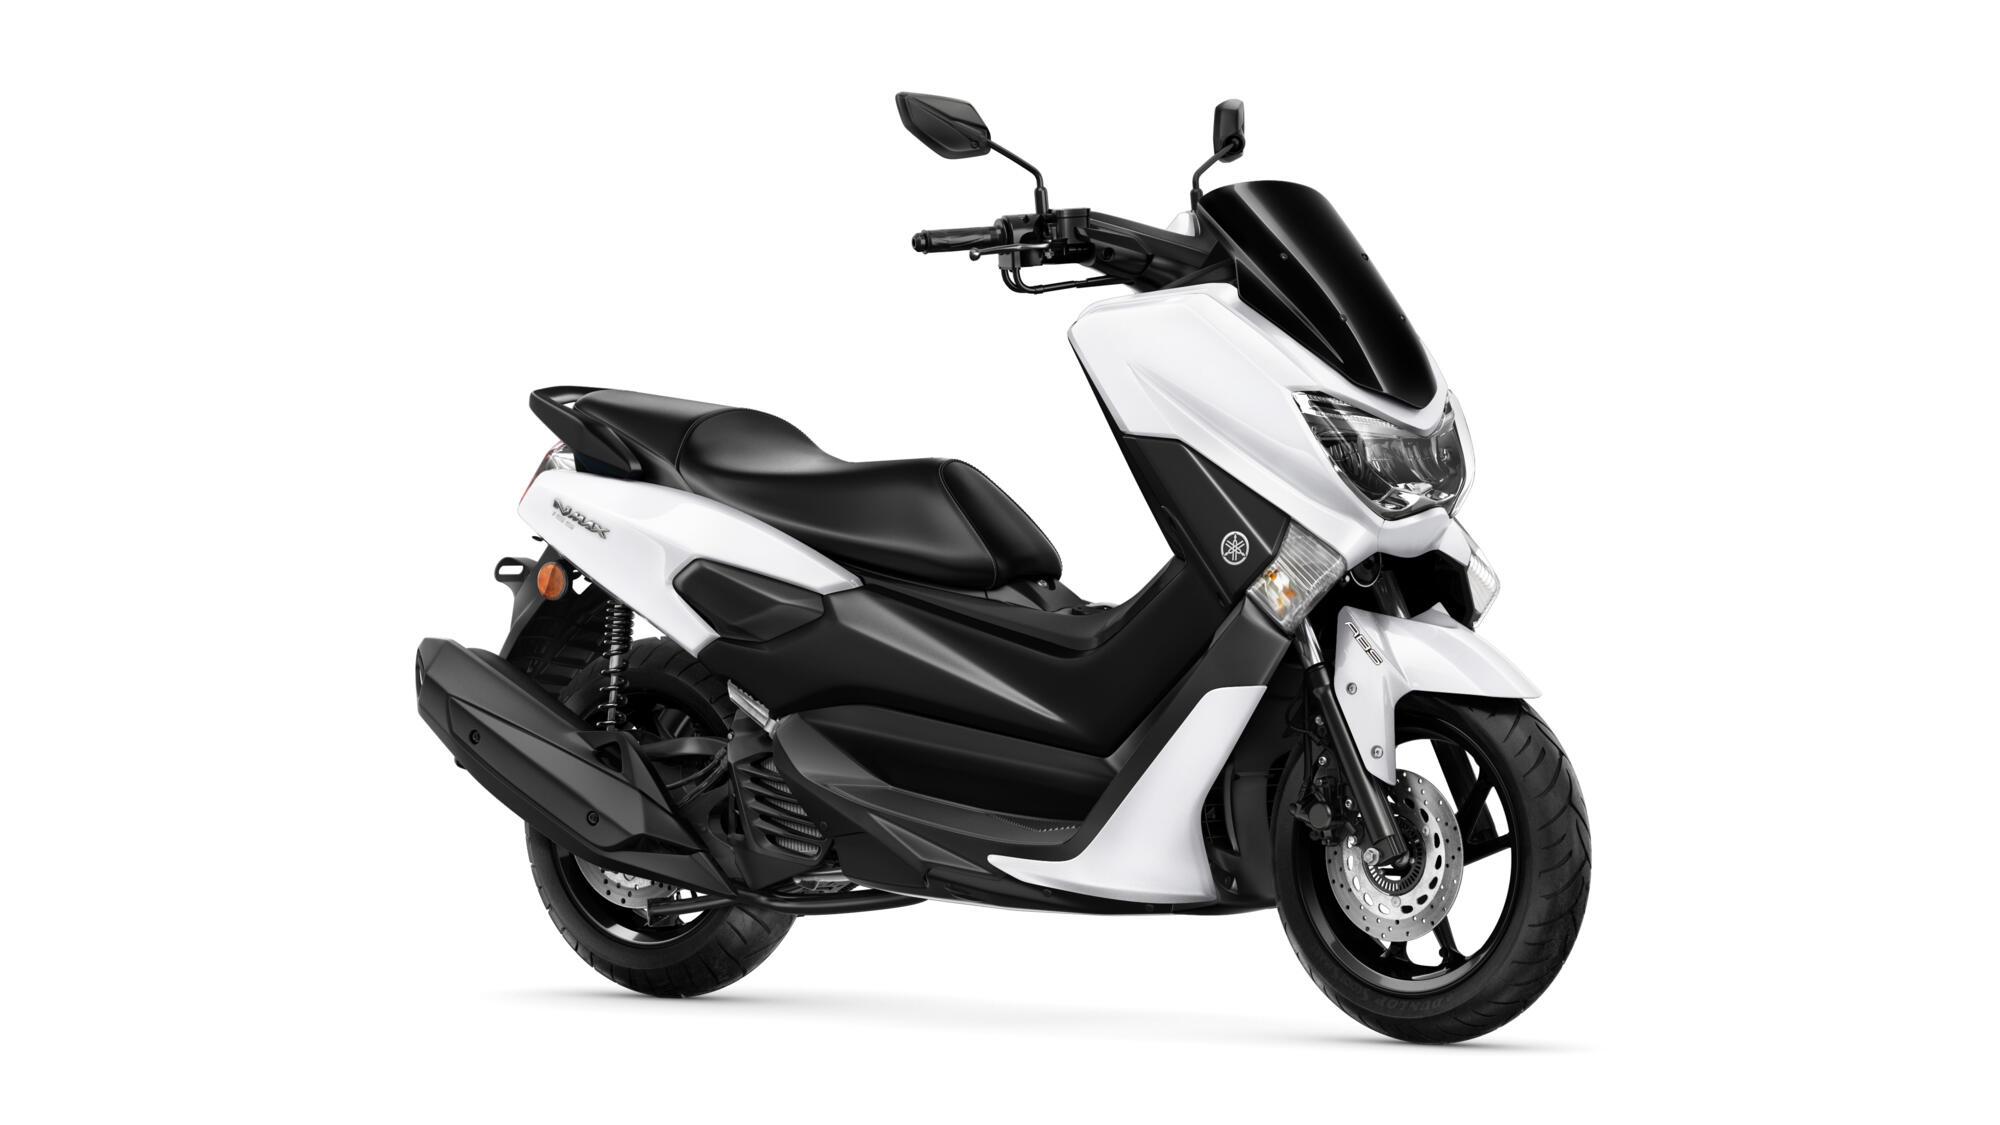 2020-Yamaha-G150-EU-Milky_White-Studio-001-03